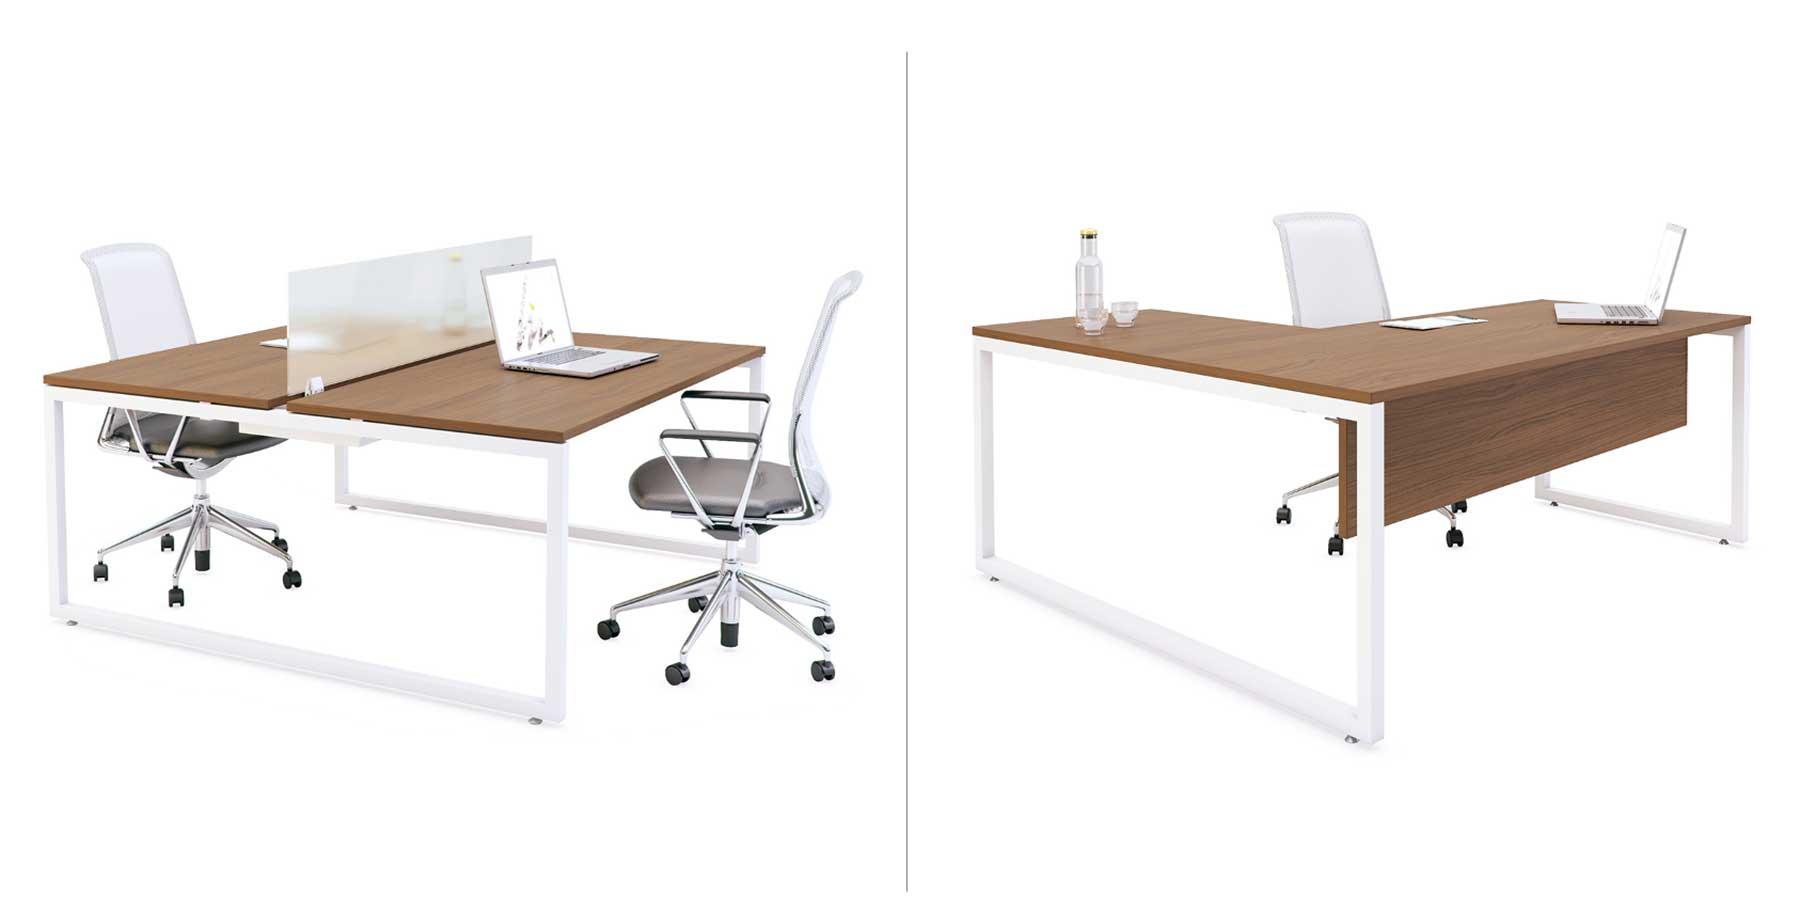 Mesas de oficina M4 de LimobelInwo